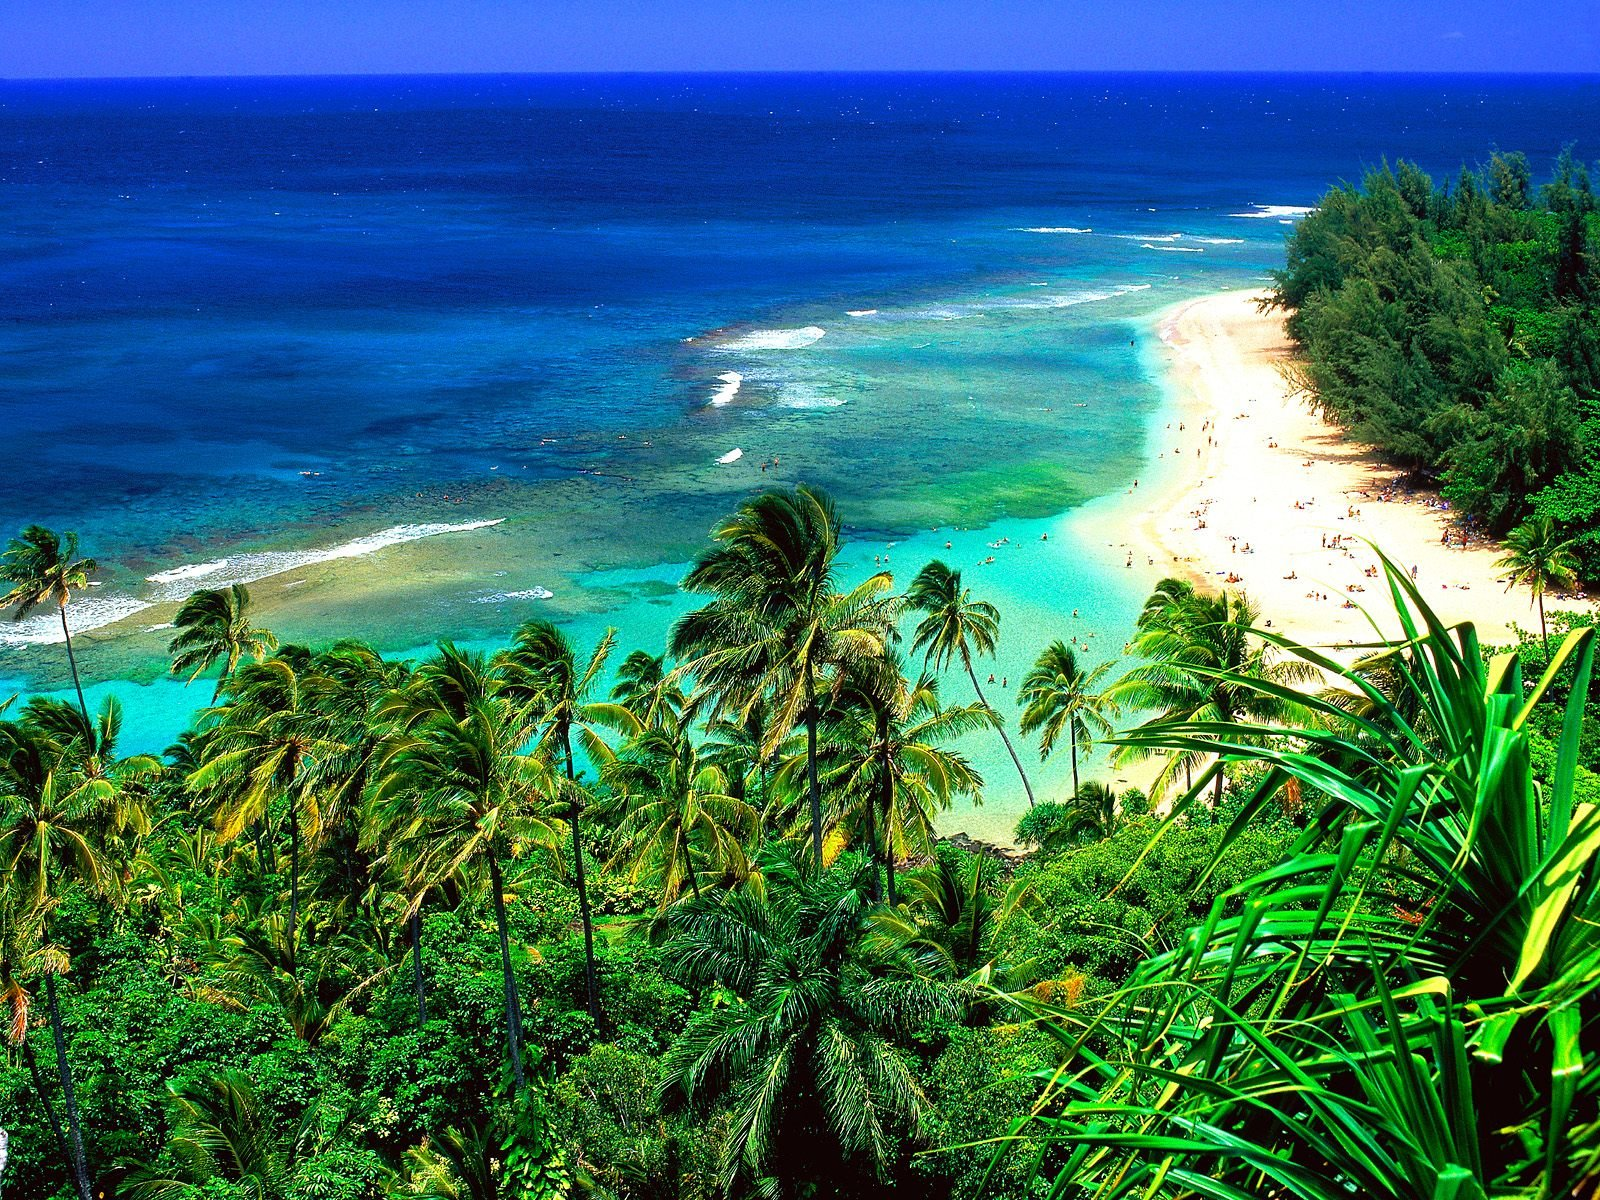 Hawaii Kee Beach - Kauai